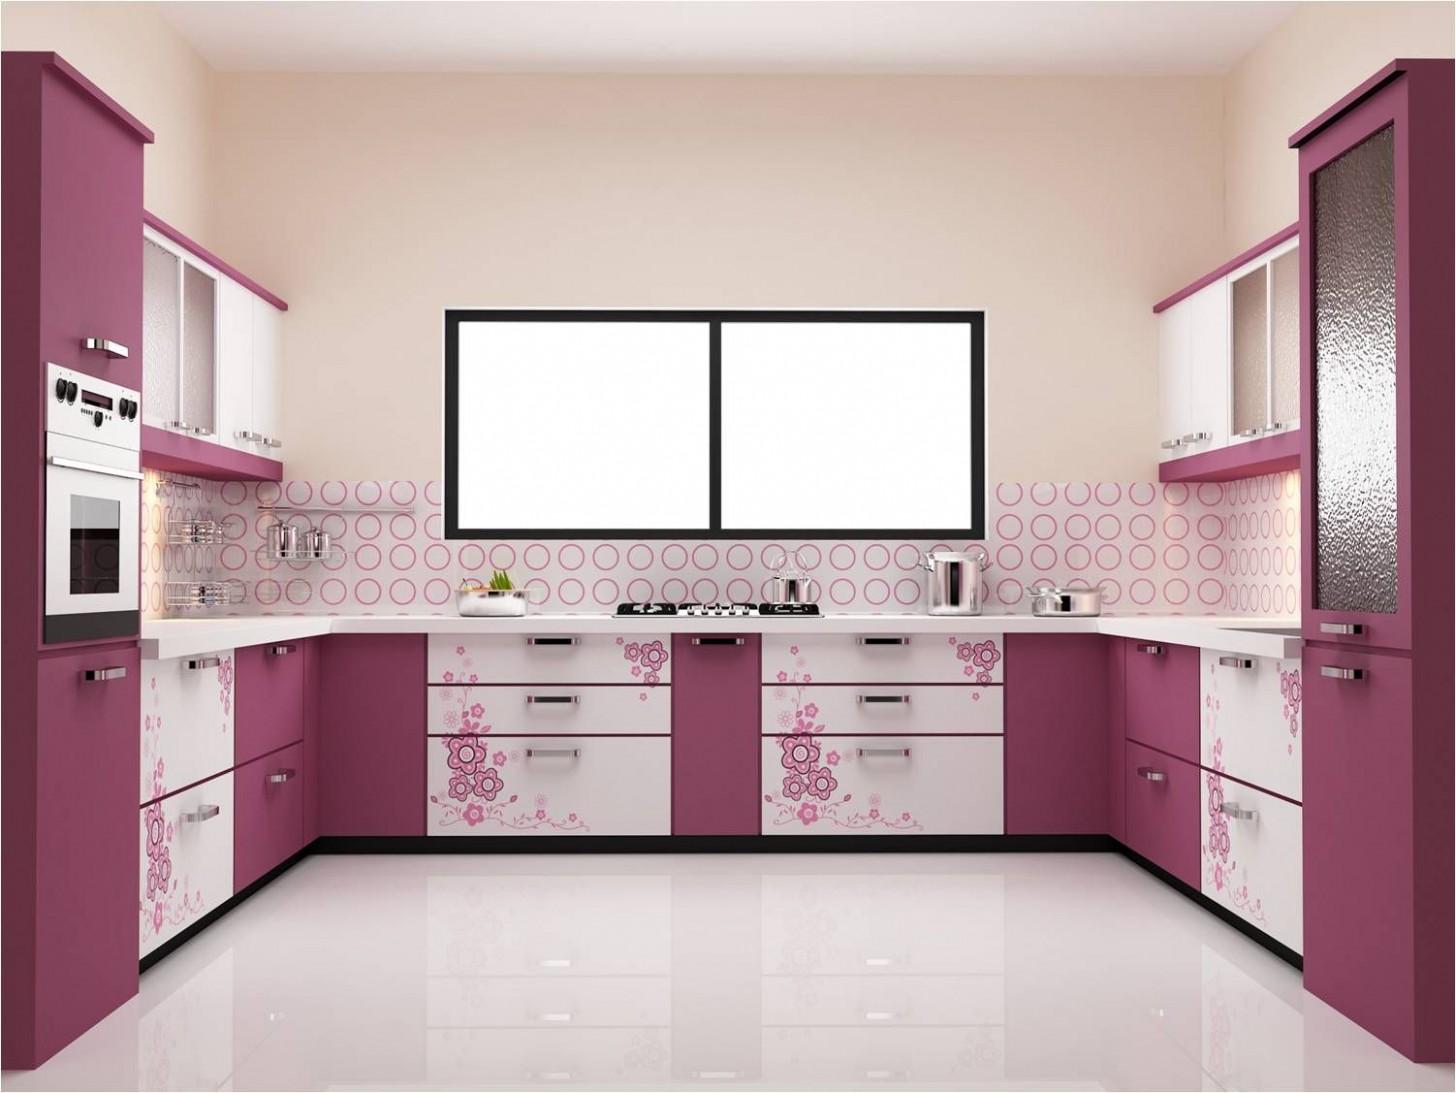 Awesome German Kitchen Designs  Kitchen modular, Simple kitchen  - Pink And Purple Kitchen Cabinets